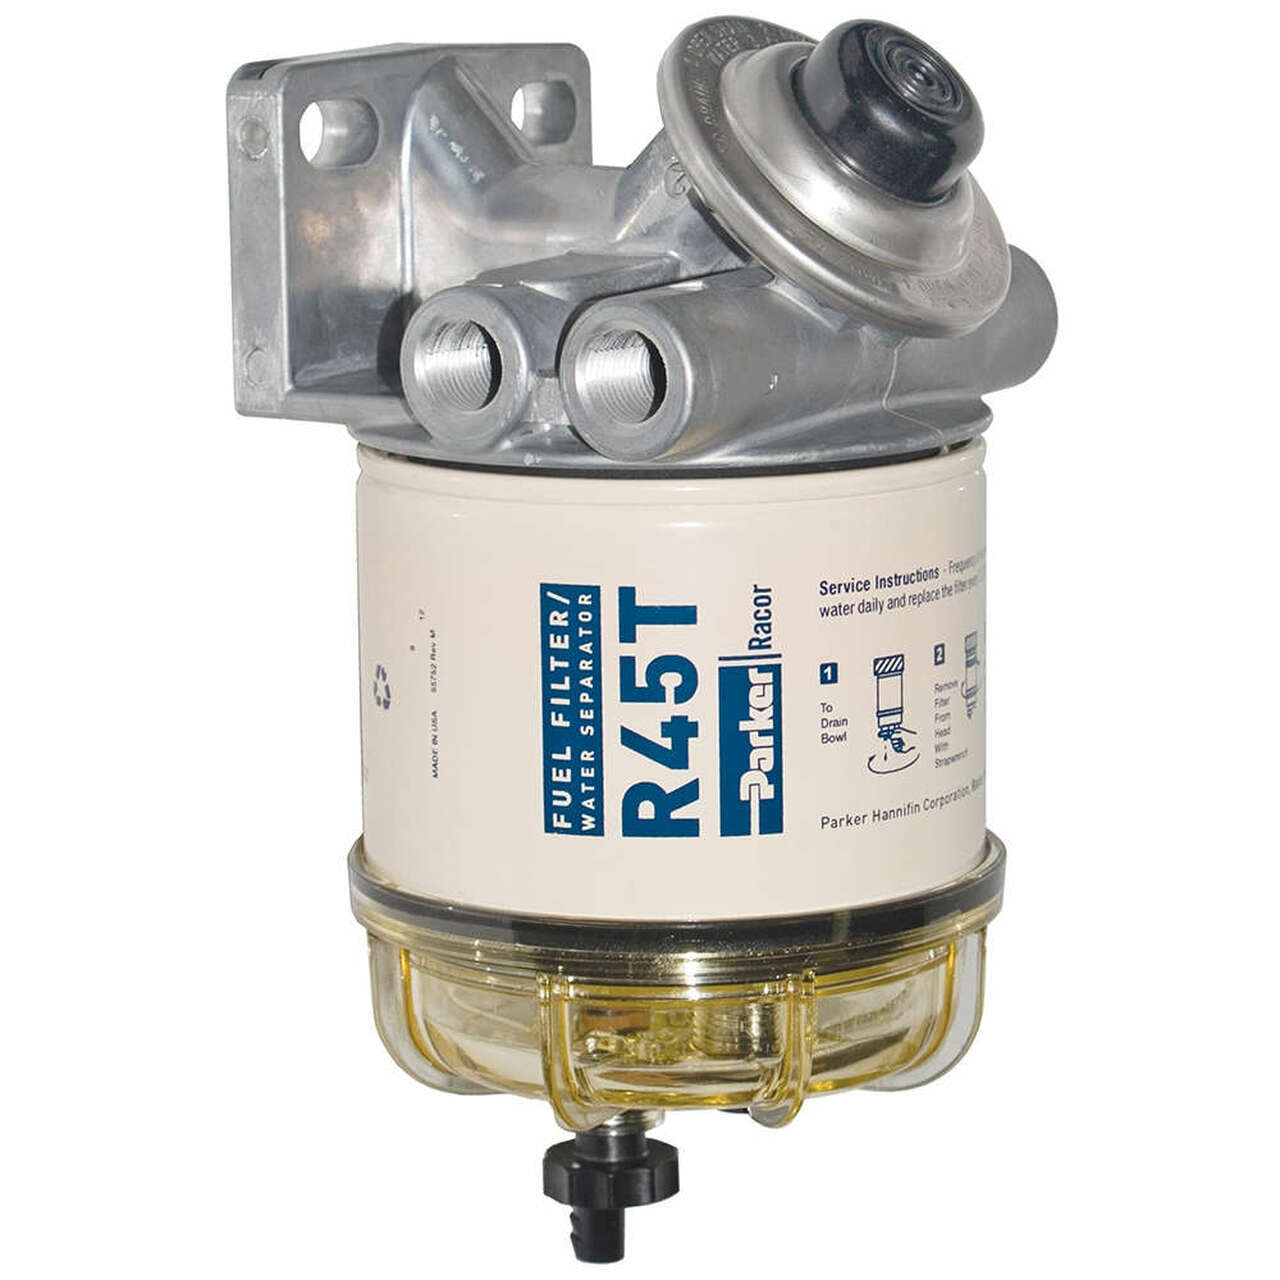 Racor 400 Series 45 GPH Diesel Spin-On Fuel Filter - 10 Micron - 6 Qty -  John M. Ellsworth Co. Inc.